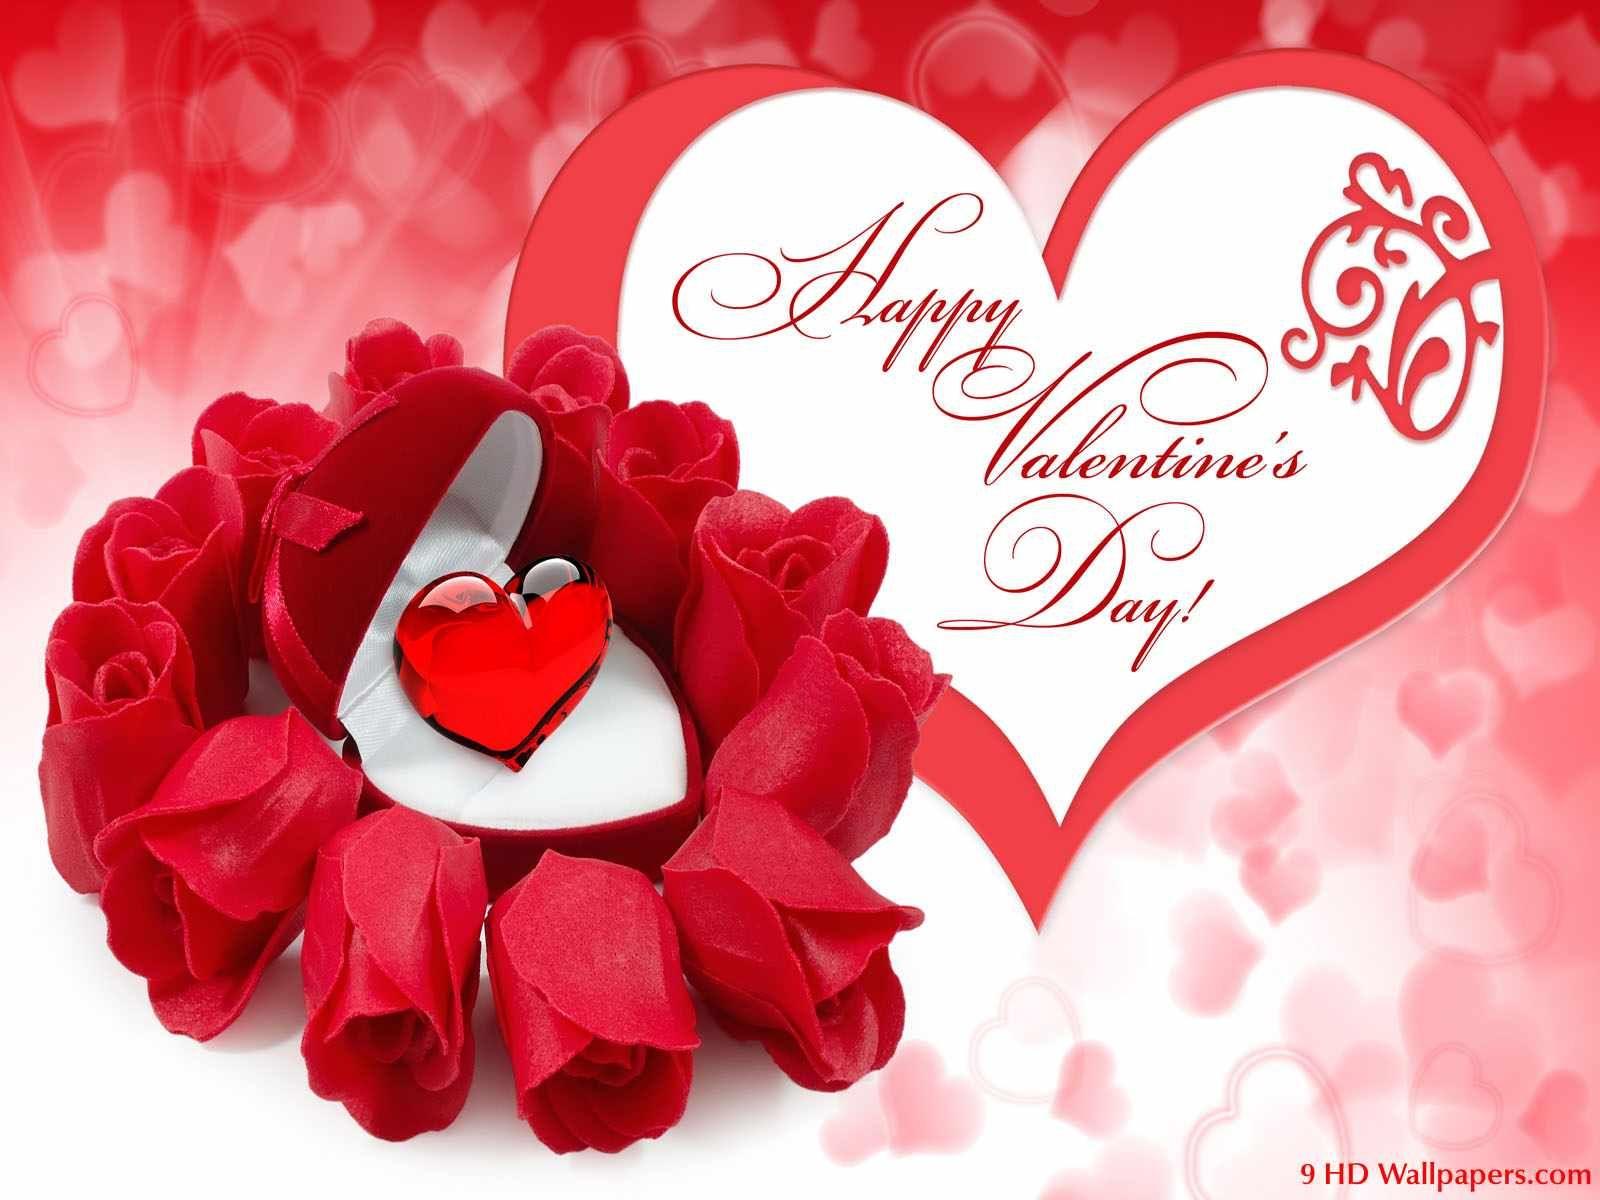 Dbsjam send online valentine card for 5 on fiverr all dbsjam send online valentine card for 5 on fiverr kristyandbryce Choice Image